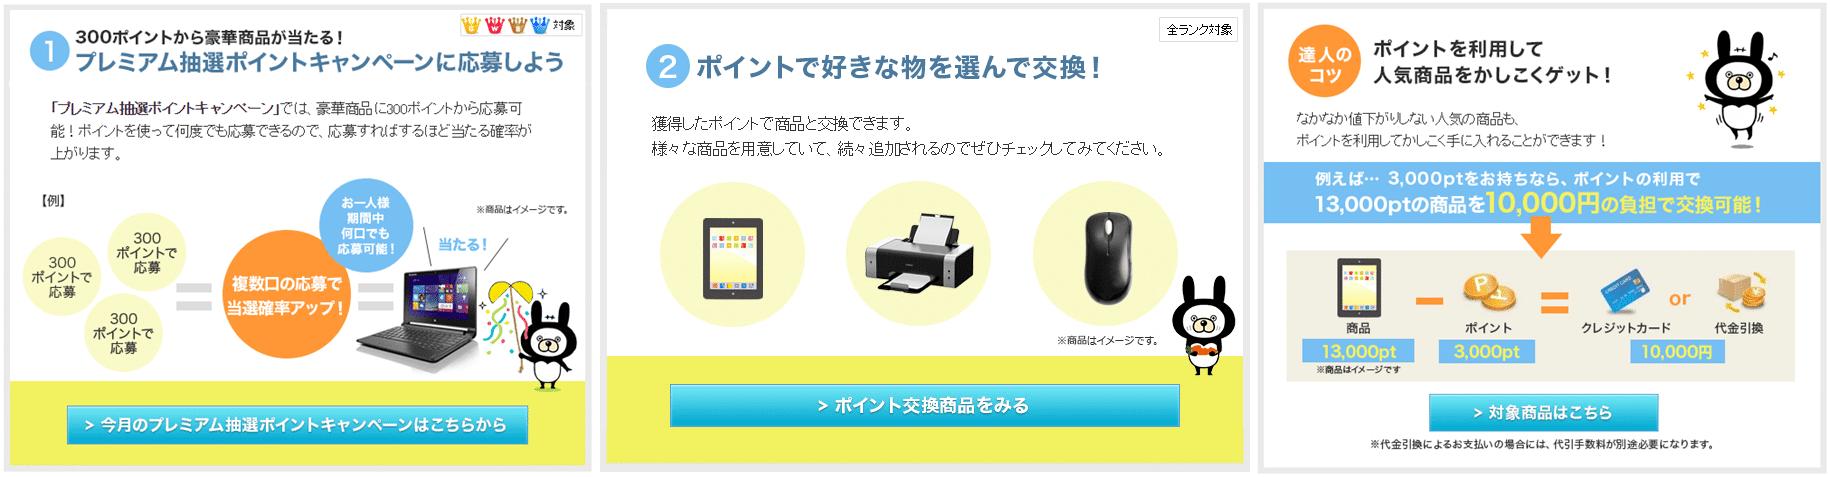 12.【NTT西日本】ポイント活用法